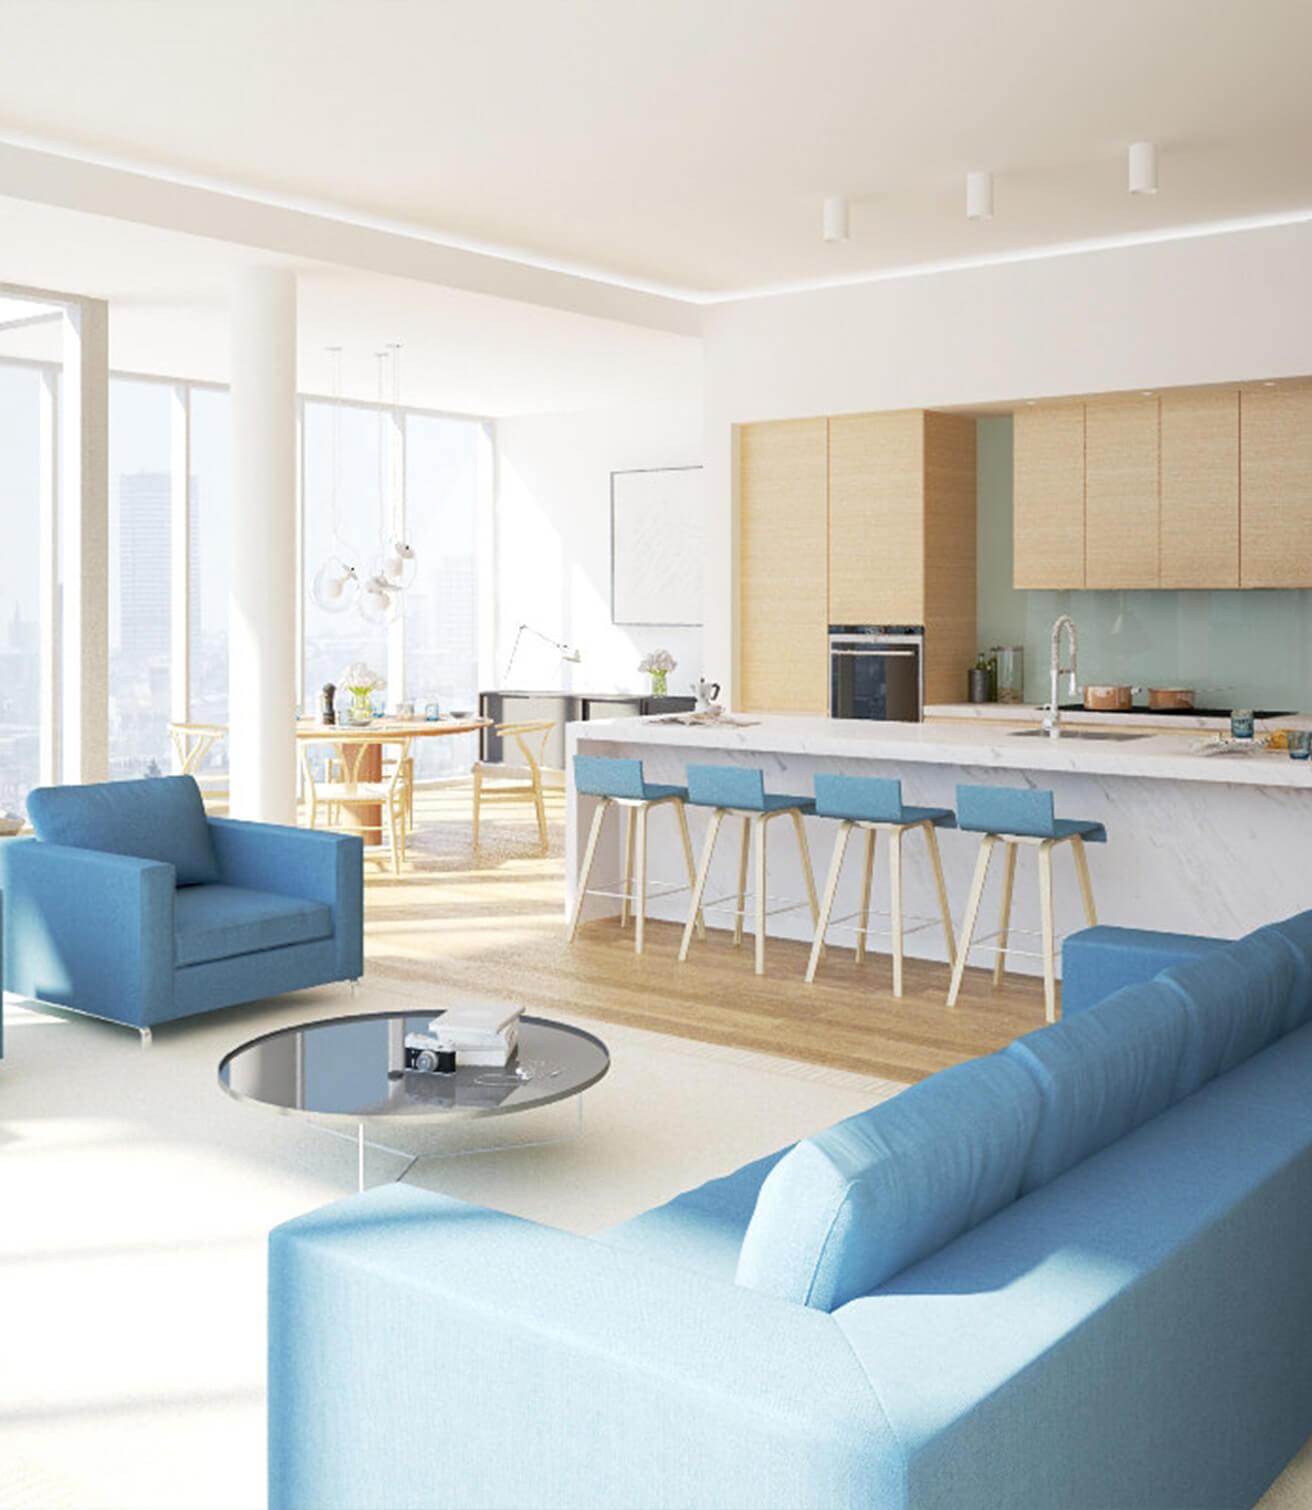 Luxury Residential Project 1bhk 2 Bhk Flats In Panvel Navi Mumbai